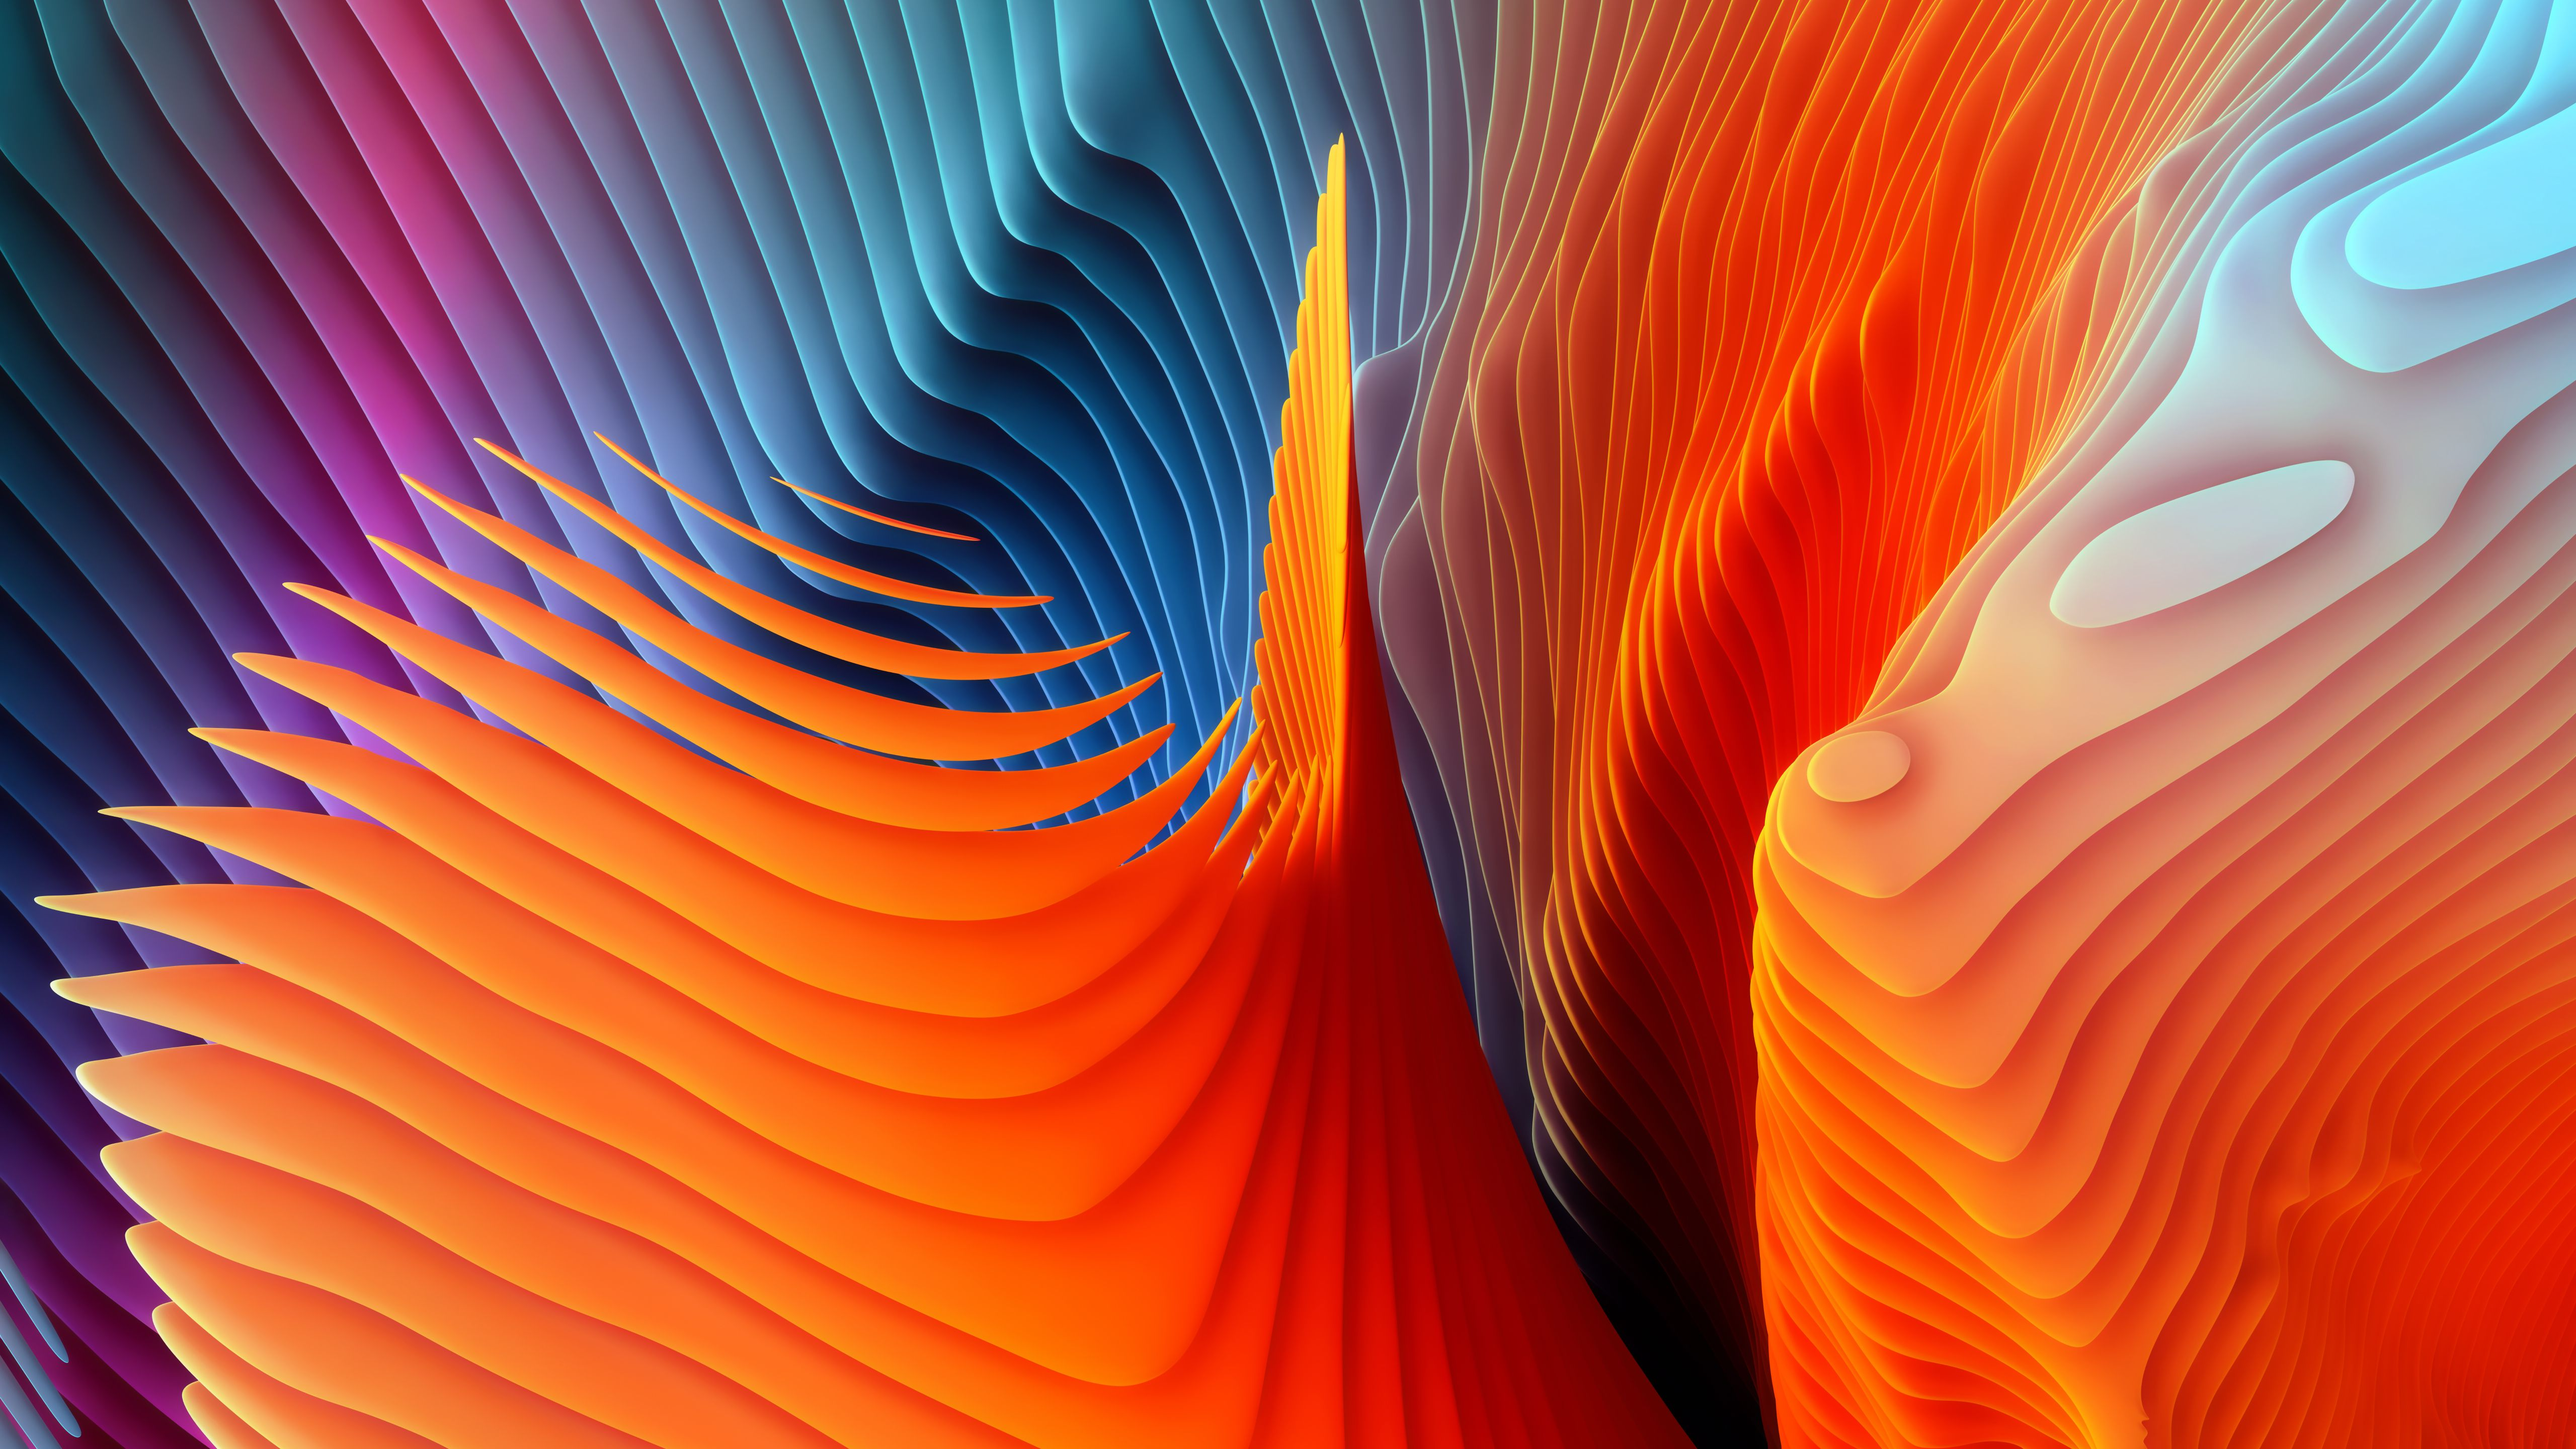 Mac 4k Wallpapers Top Free Mac 4k Backgrounds